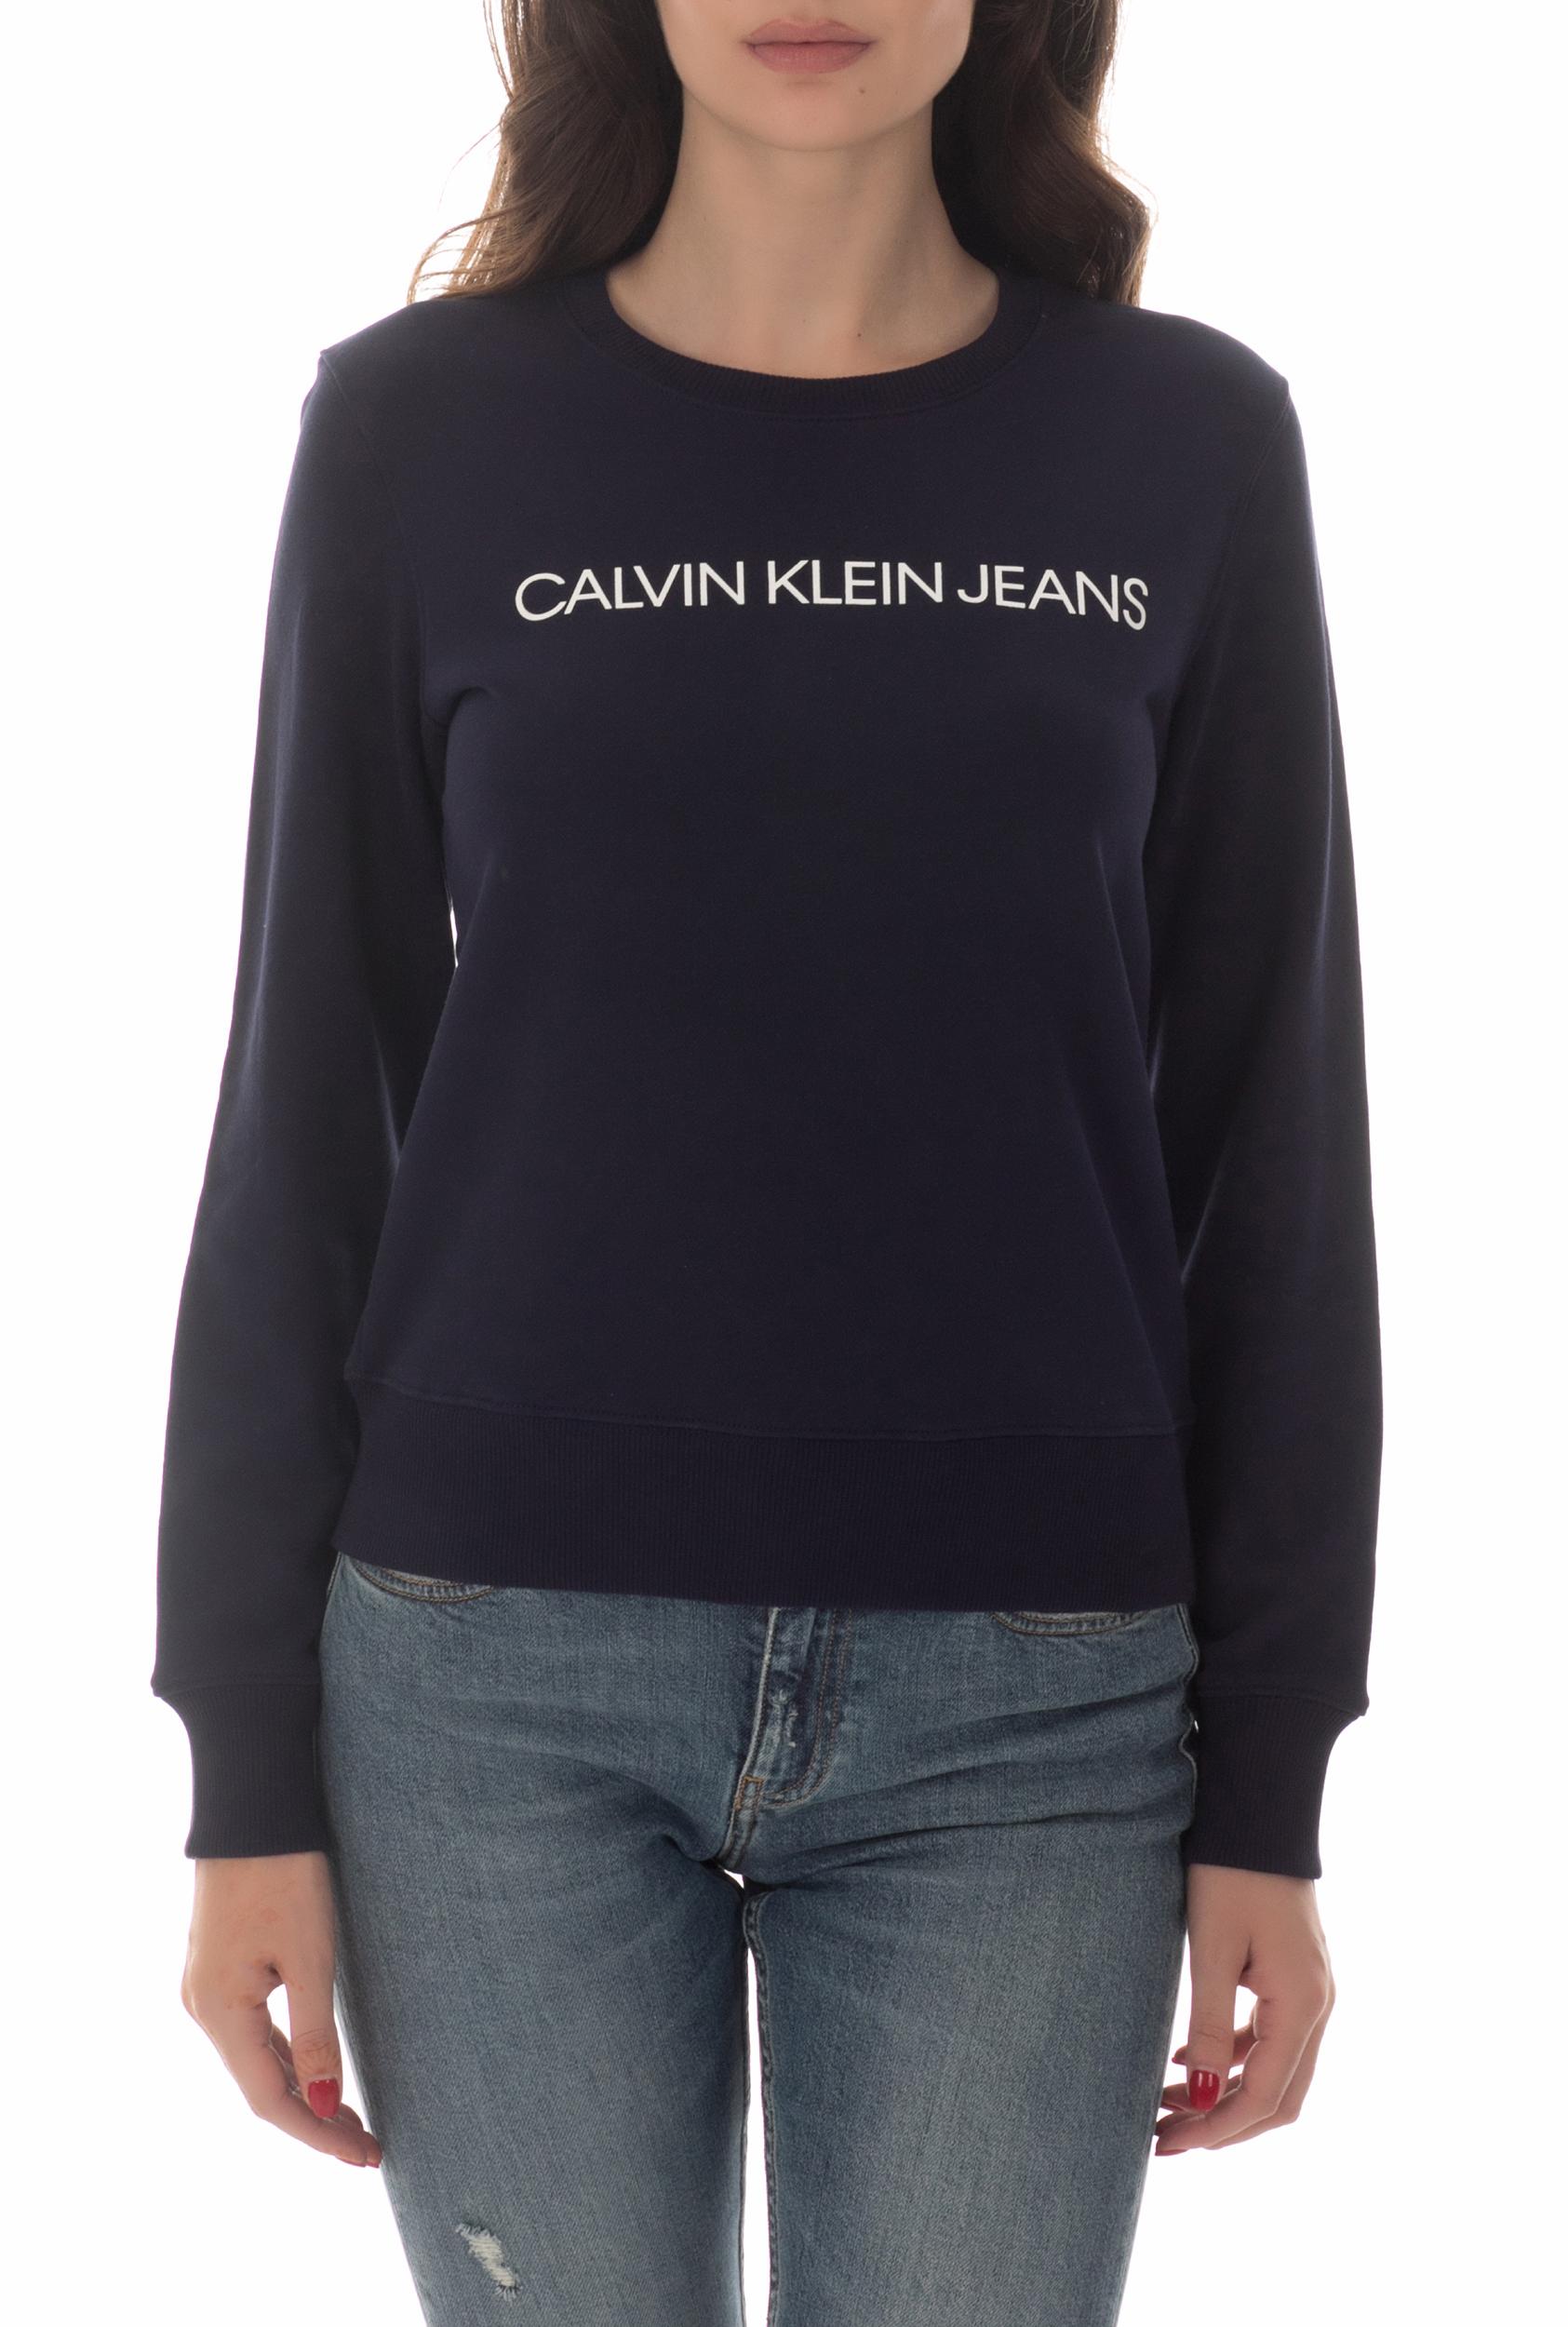 CALVIN KLEIN JEANS - Γυναικείο φούτερ CALVIN KLEIN JEANS ναυτικό μπλε